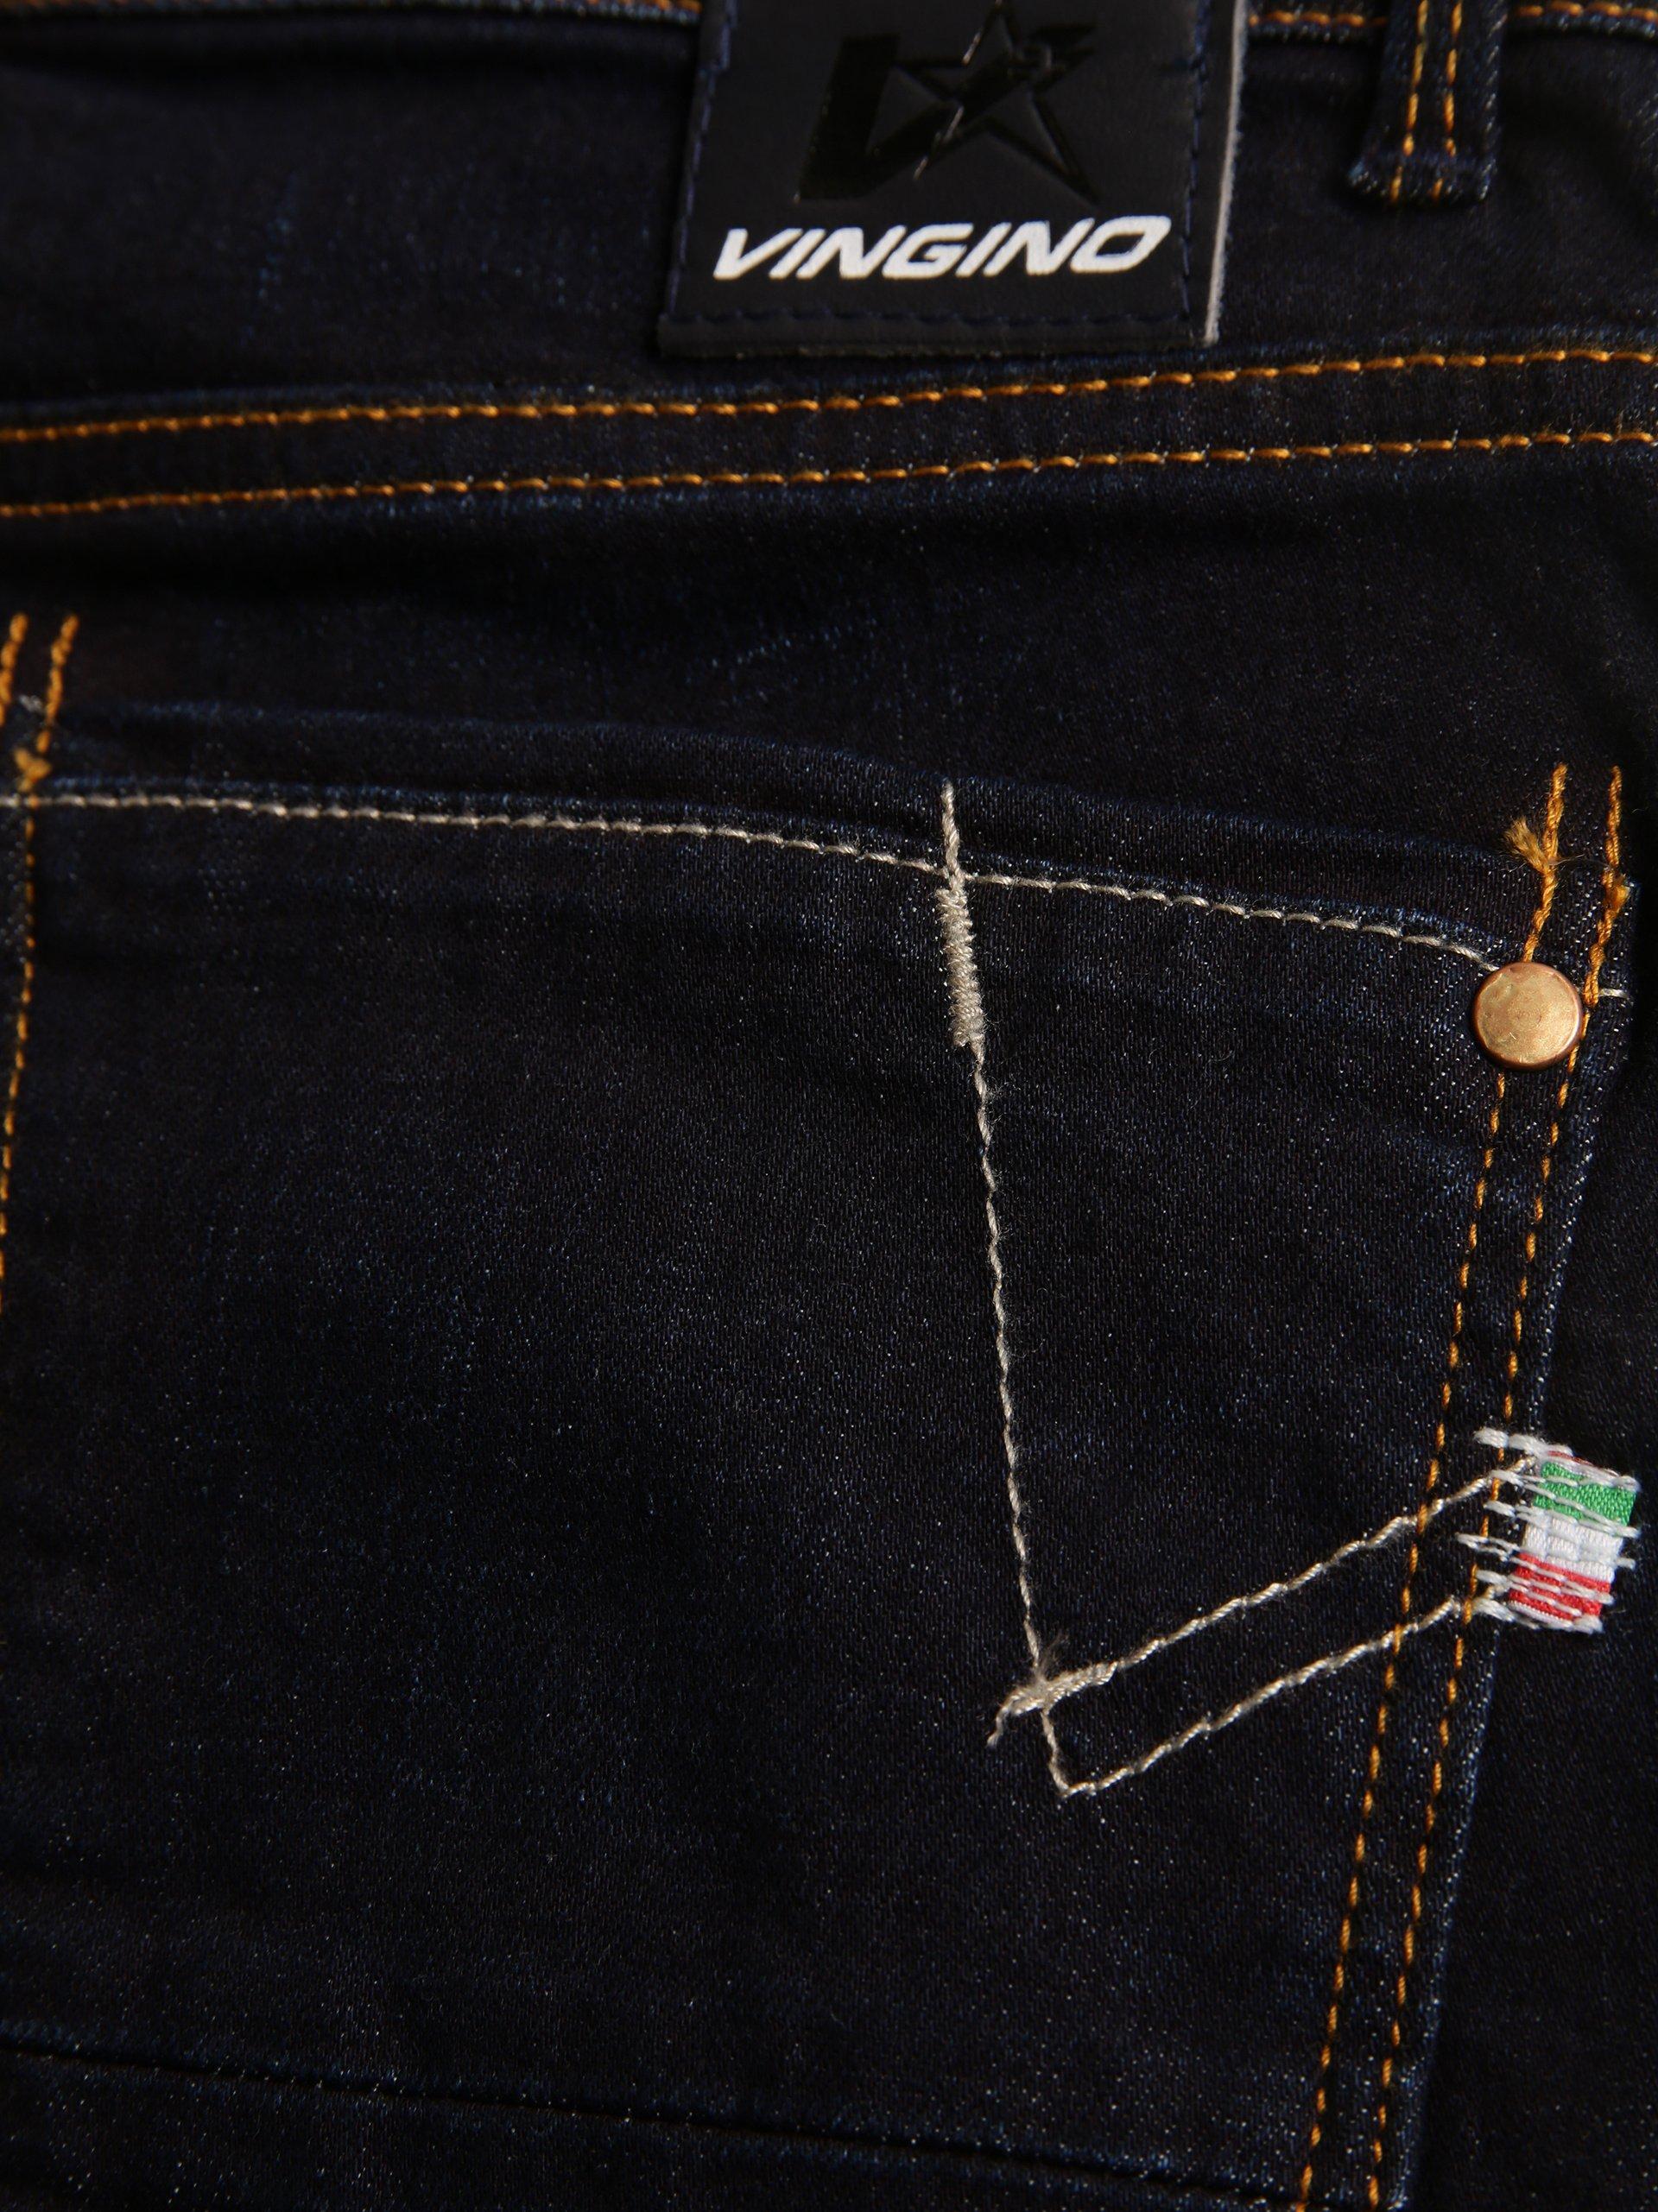 40f2e624c345b Vingino Jungen Jeans Skinny Fit - Alex online kaufen | VANGRAAF.COM